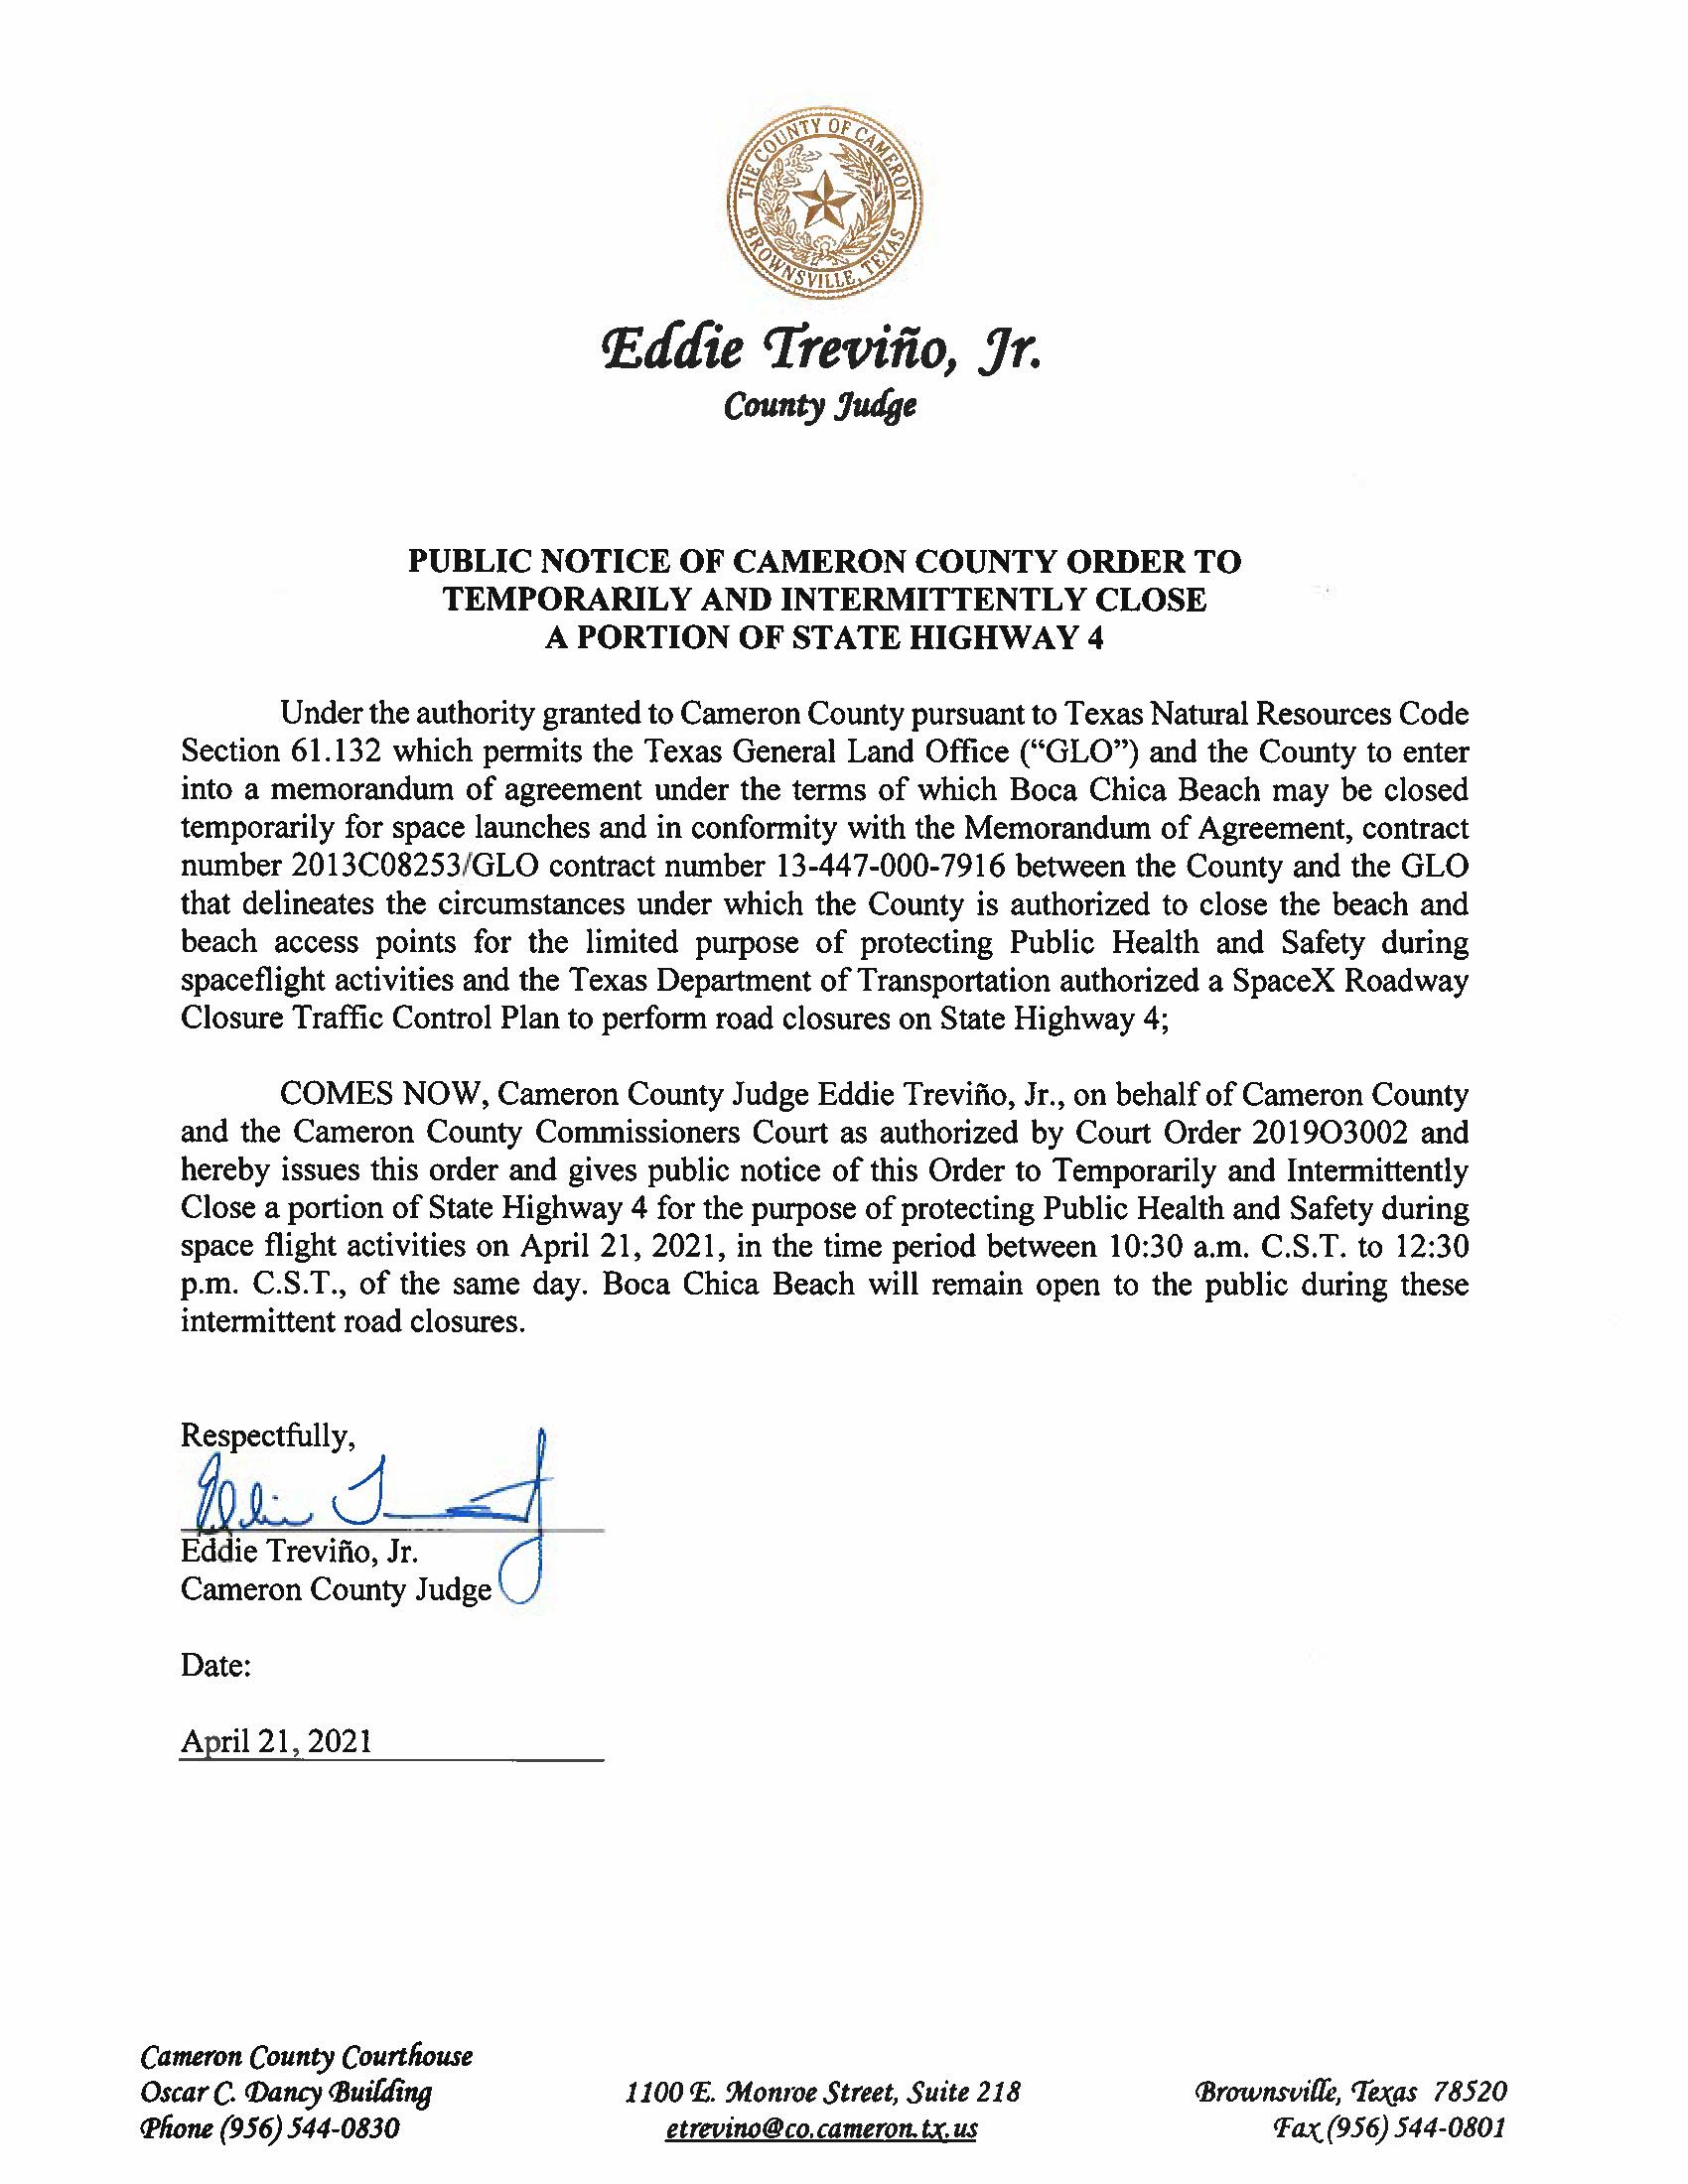 PUBLIC NOTICE OF CAMERON COUNTY ORDER TO TEMP. ROAD CLOSURE. 04.21.2021